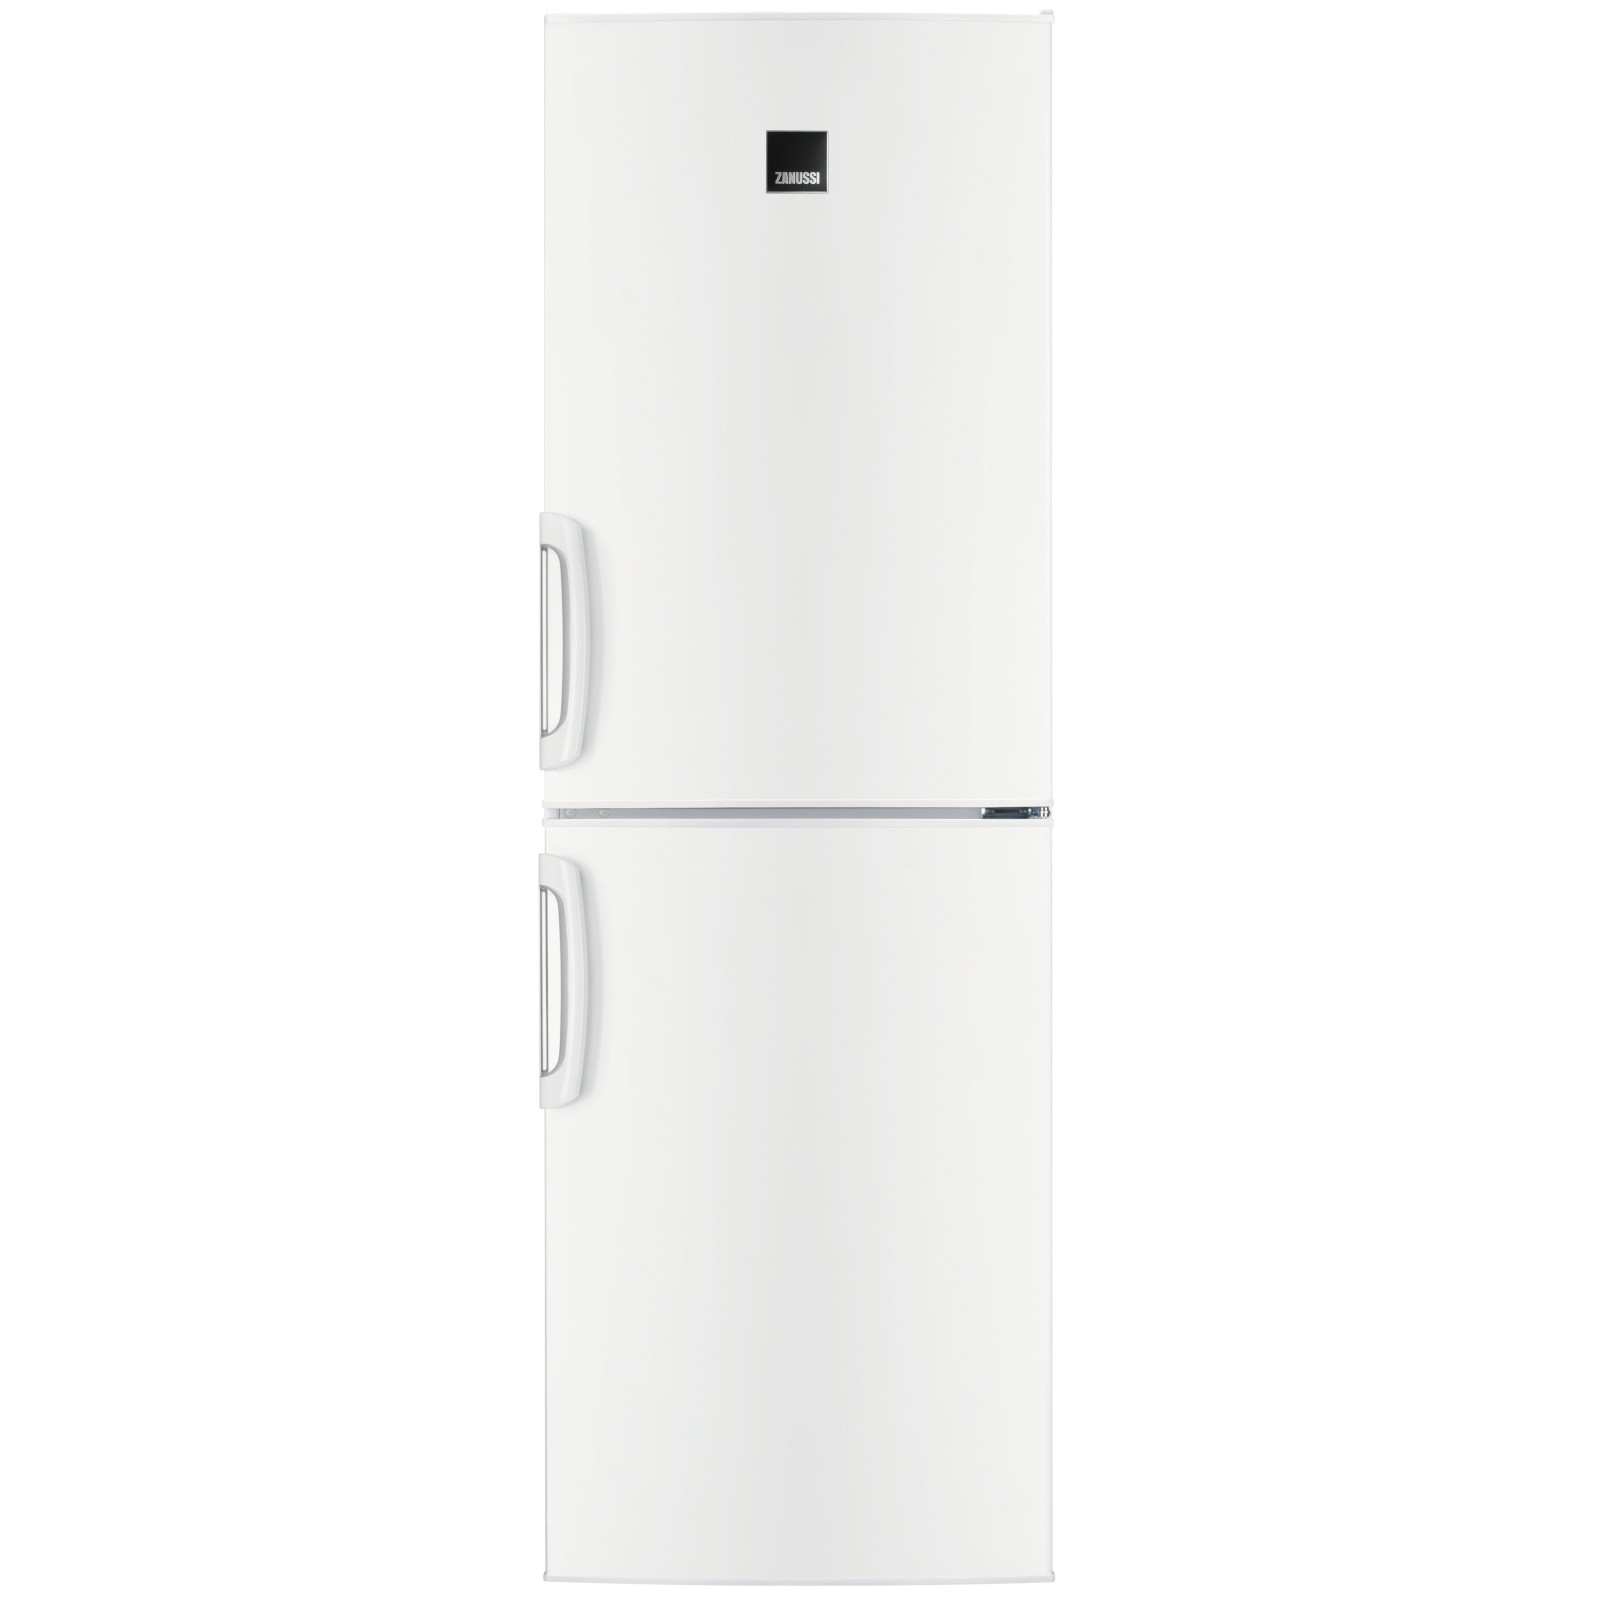 Zanussi ZRB34426WA Fridge Freezer